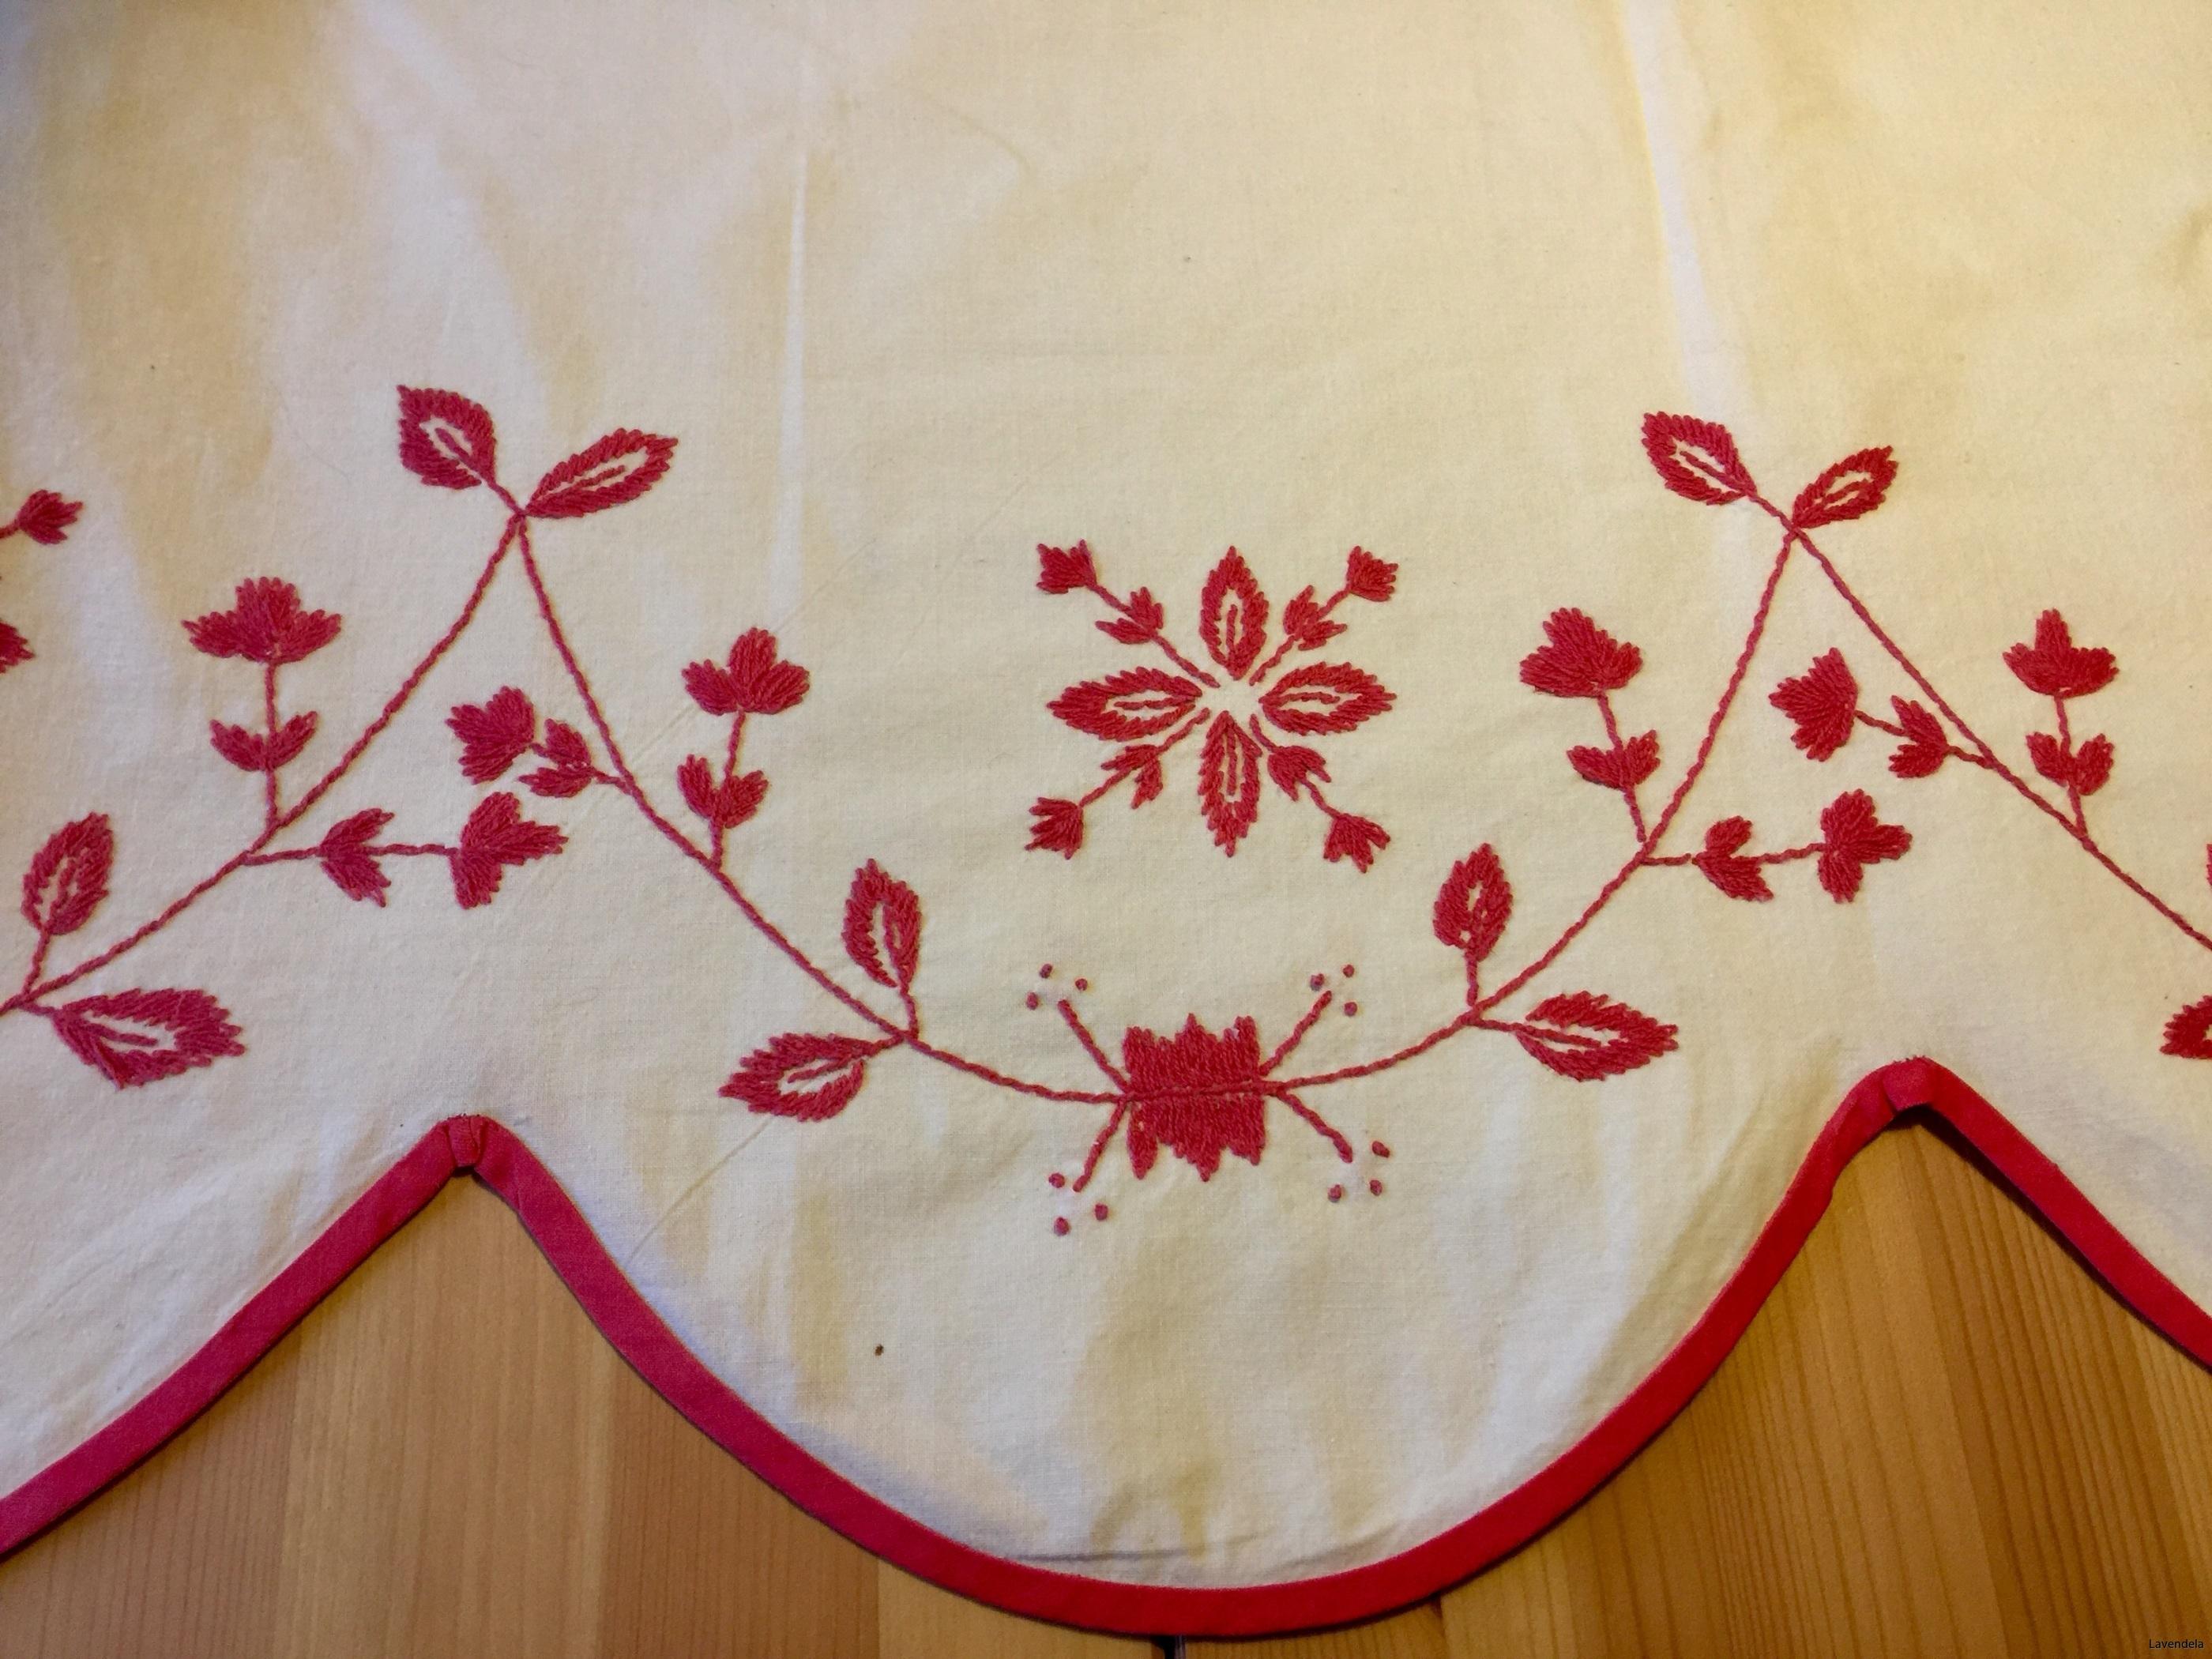 Ena gardinen: 230 x60 cm